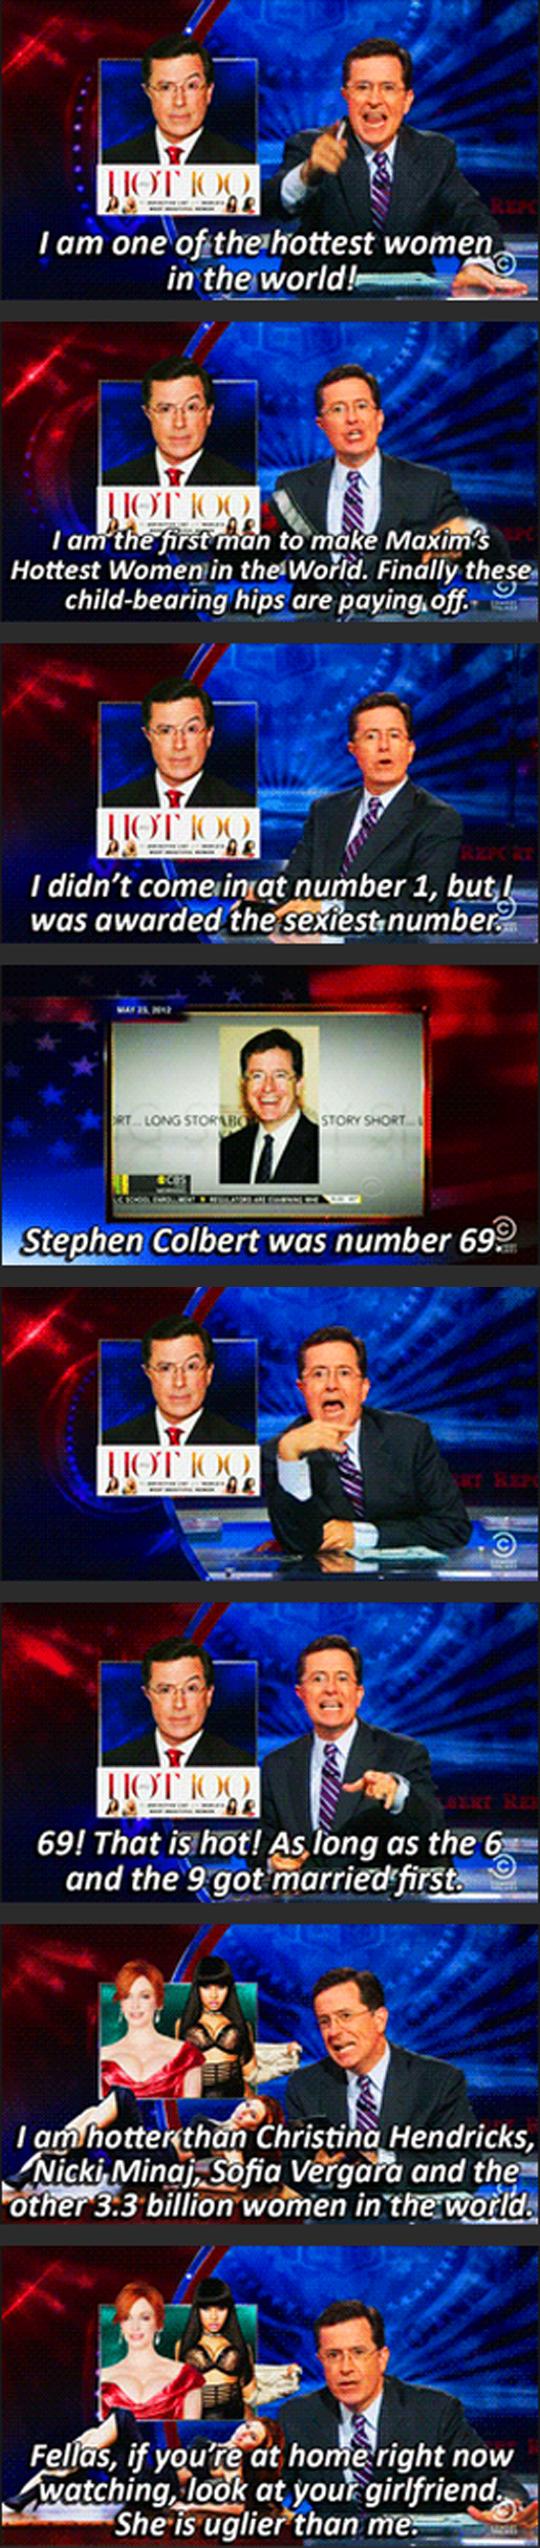 Colbert Finally Made It